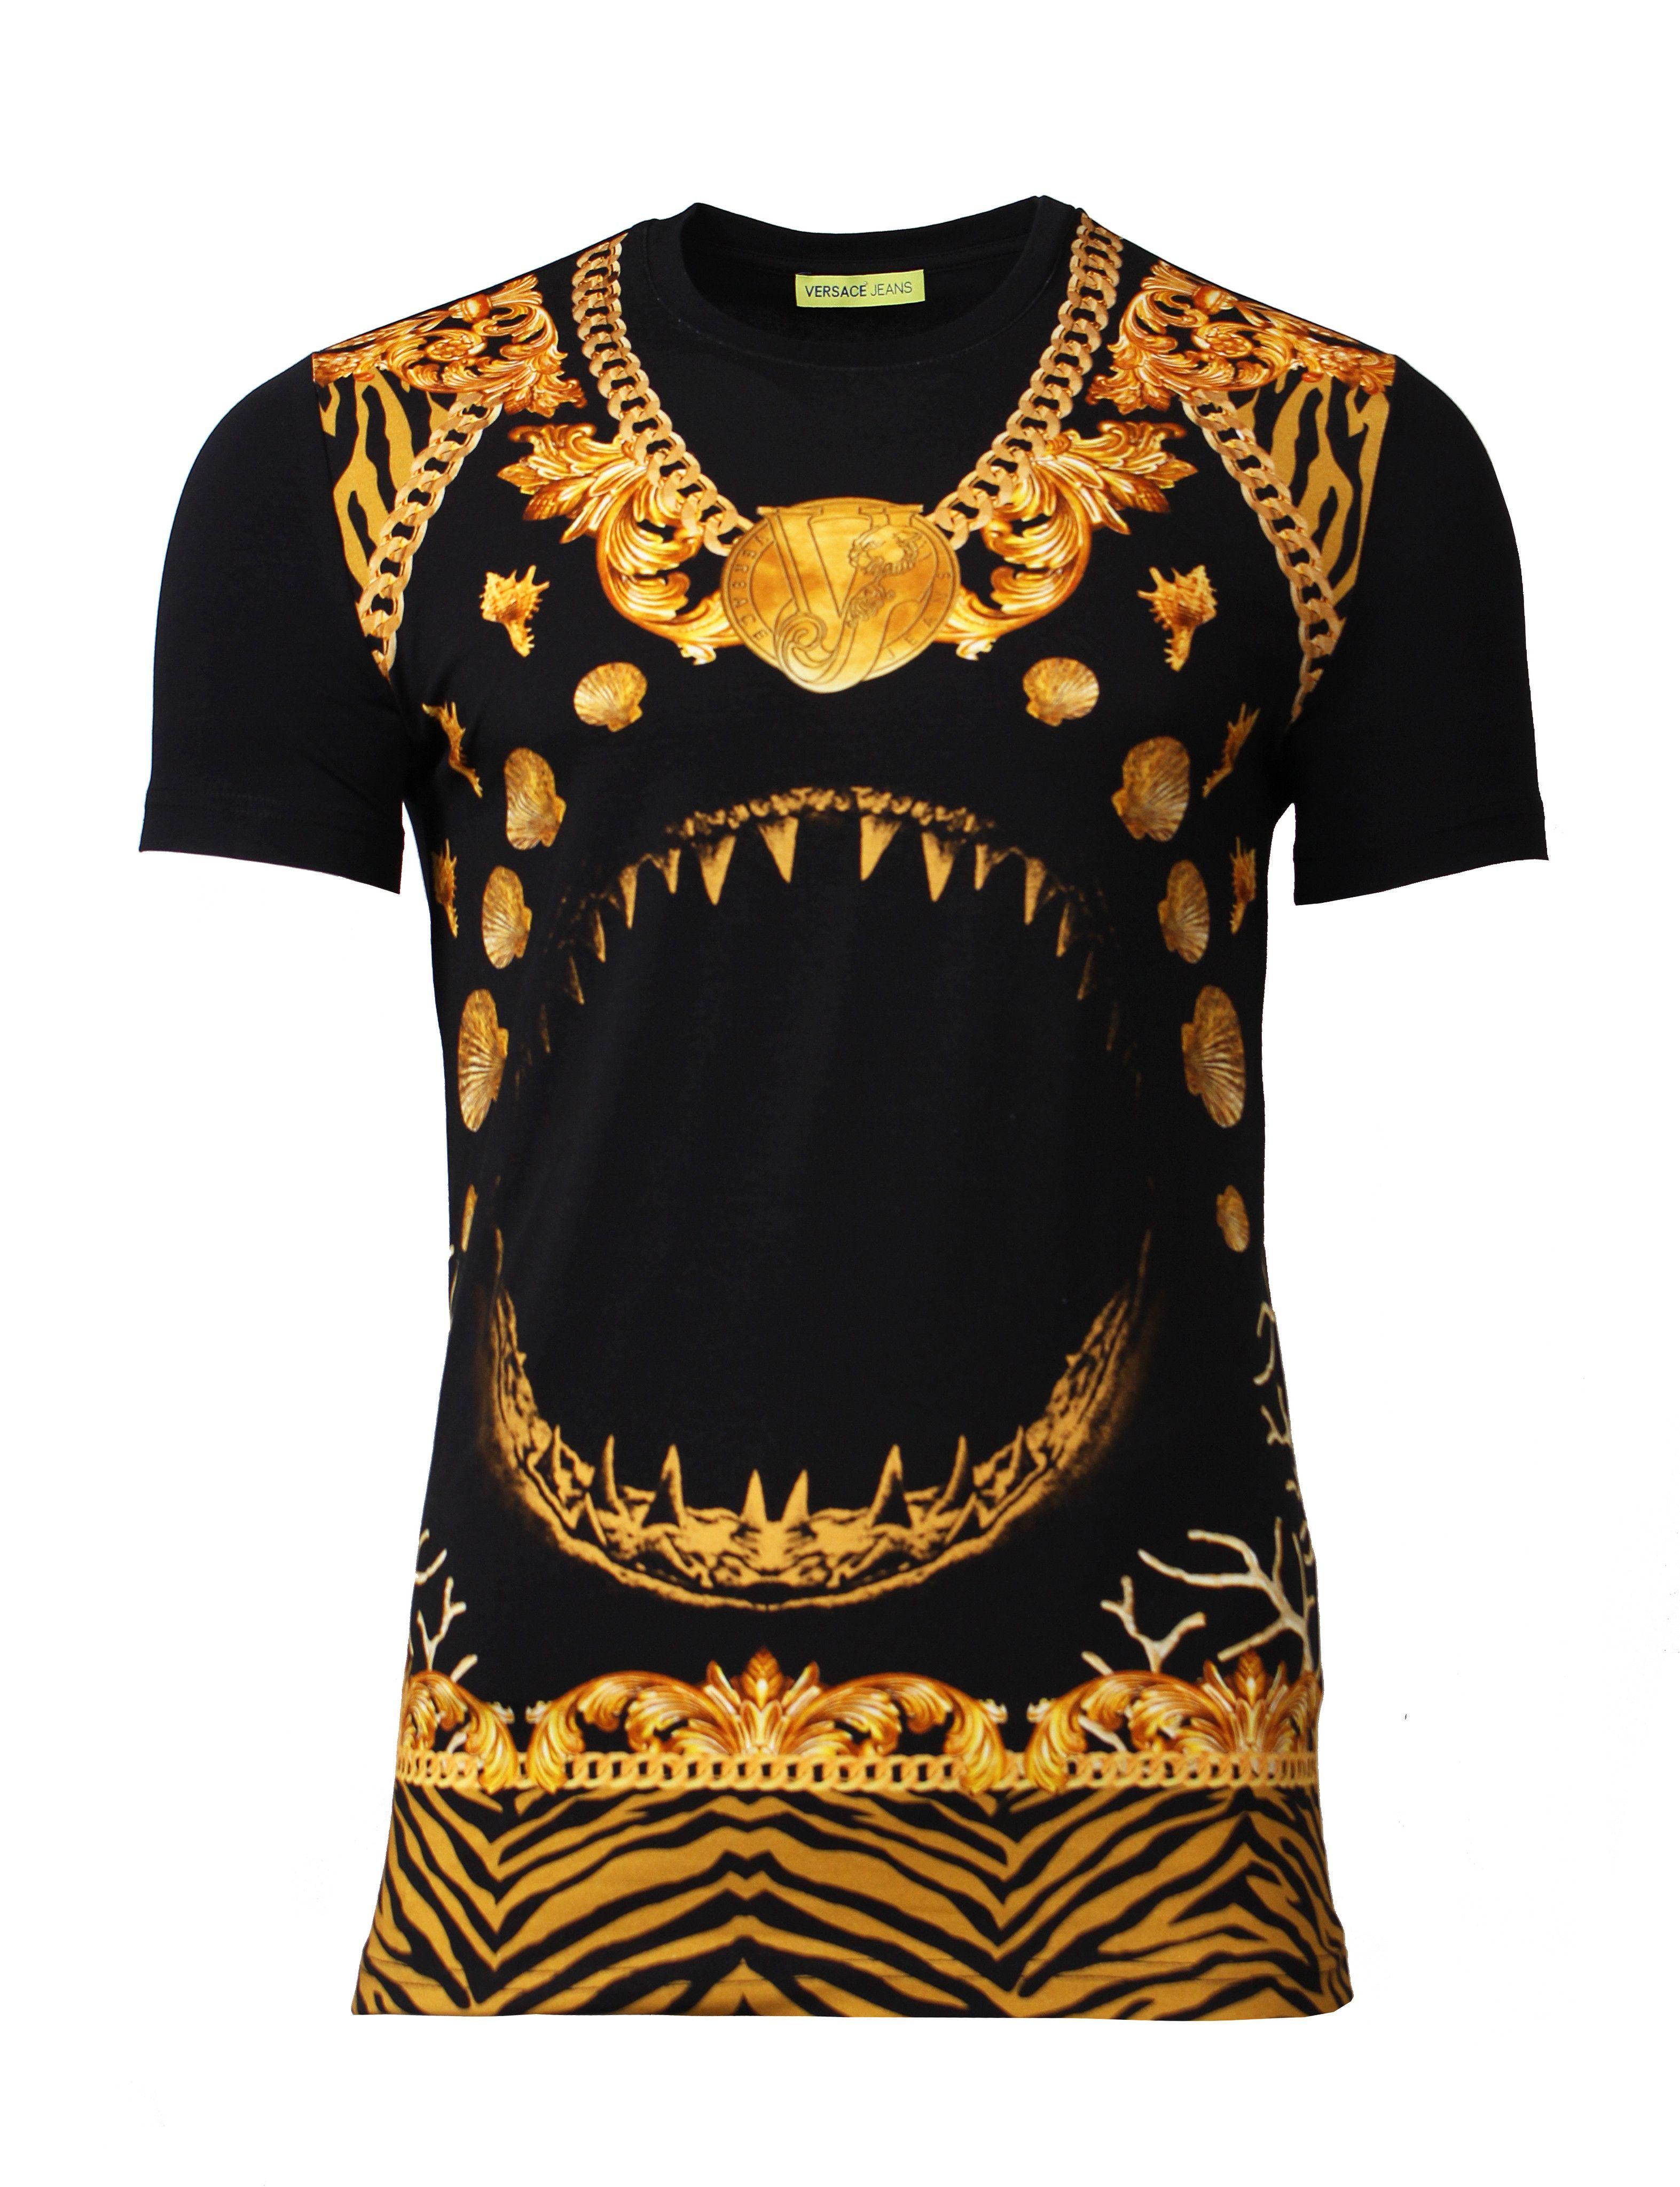 b5b9a5b20 Jersey Manarola(BLACK). Jersey Manarola(BLACK) Versace T-shirt